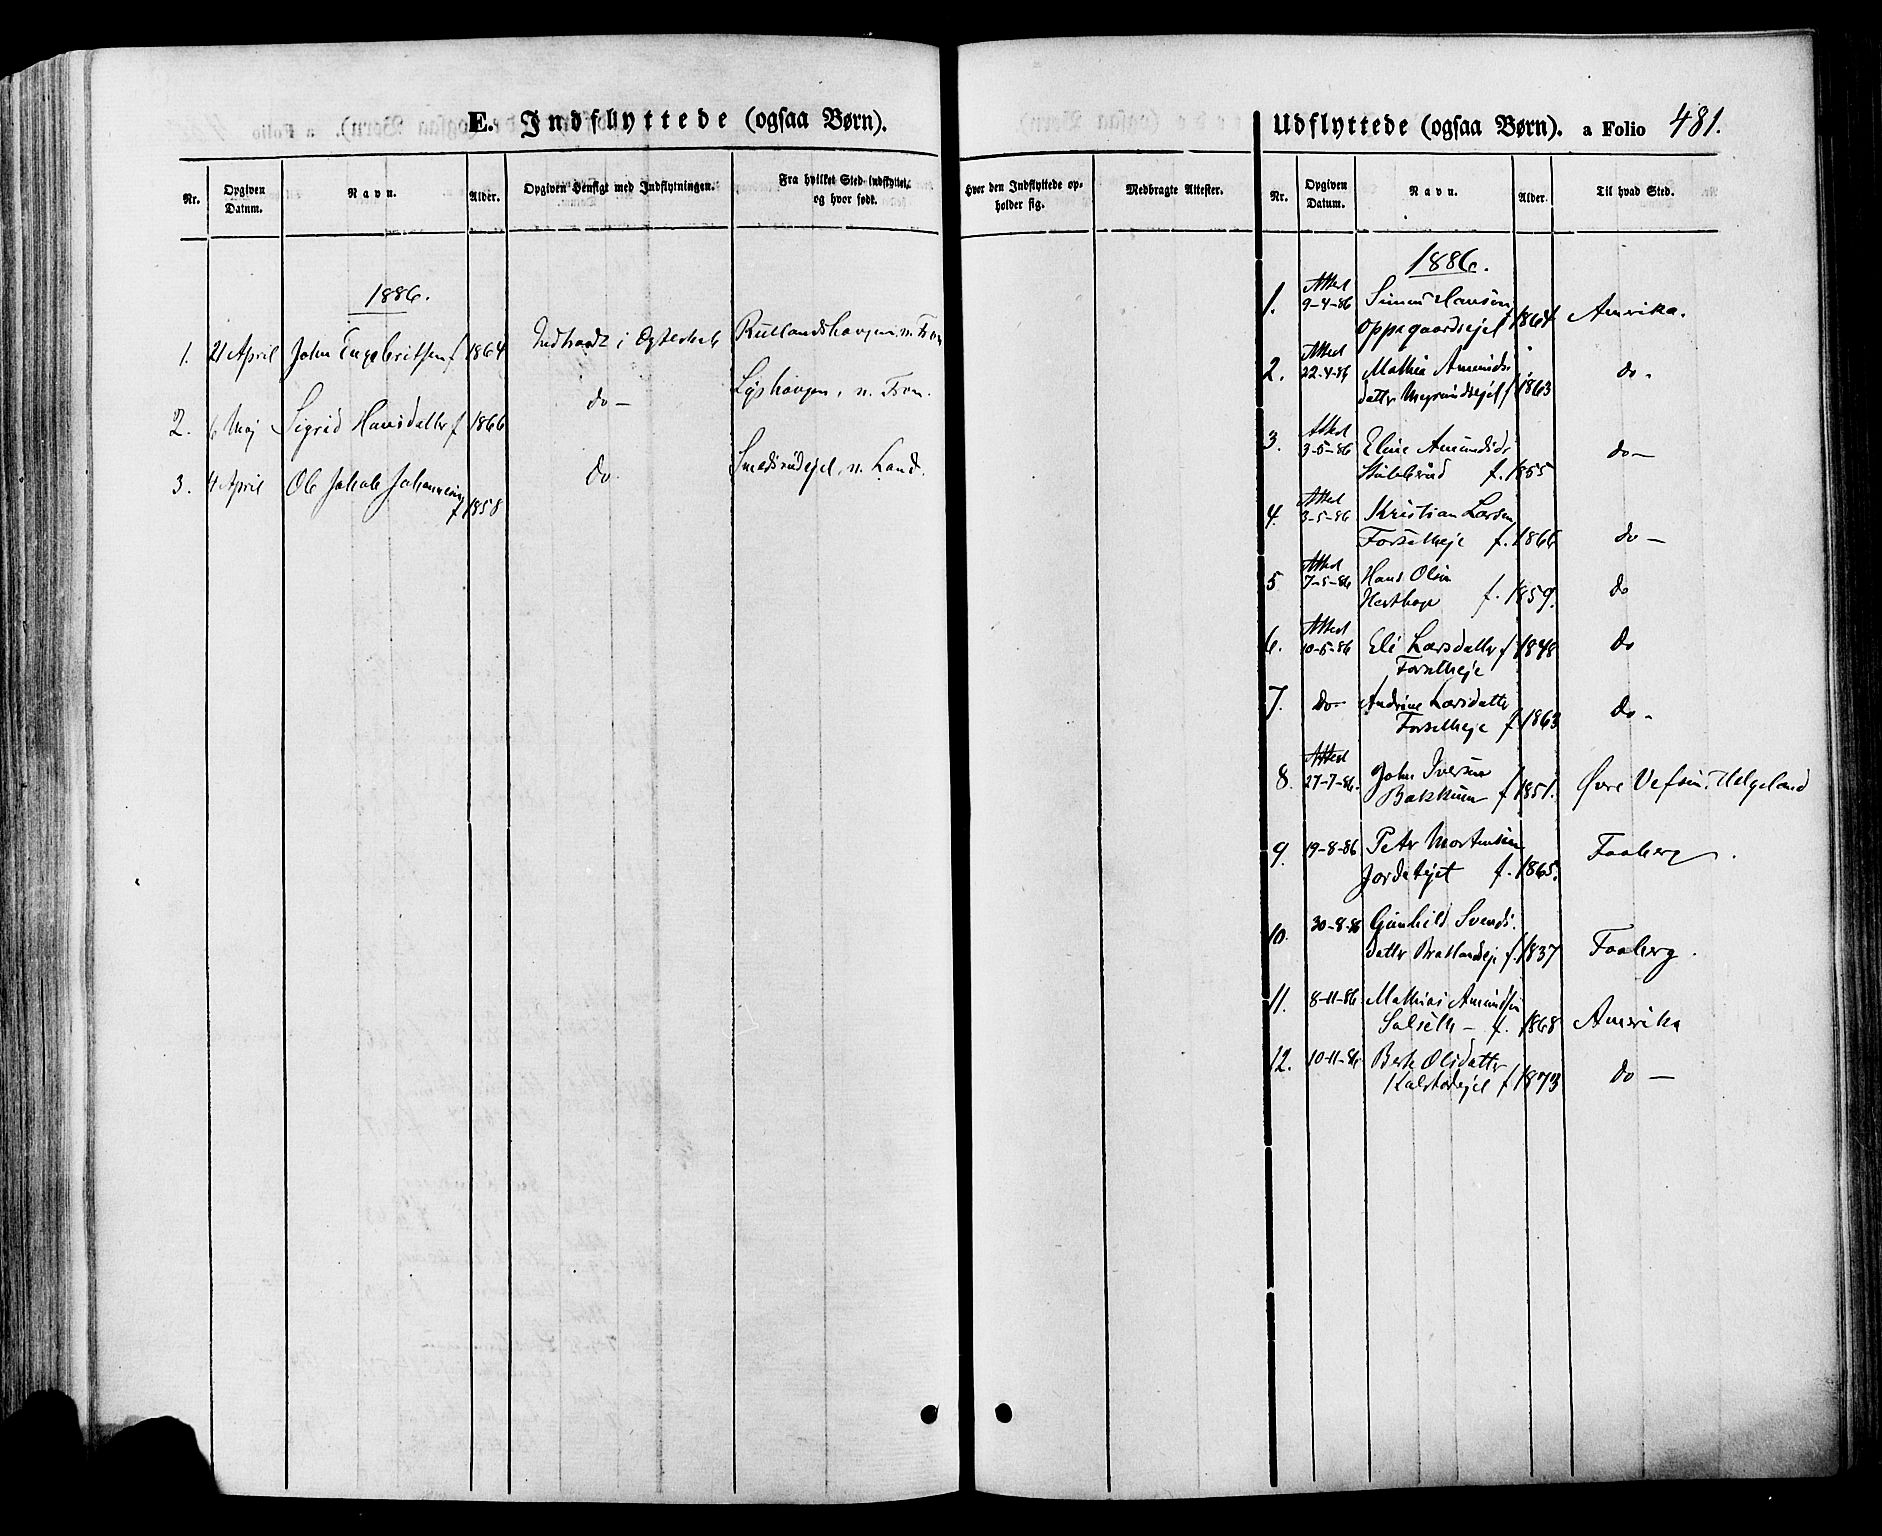 SAH, Gausdal prestekontor, Ministerialbok nr. 10, 1867-1886, s. 481